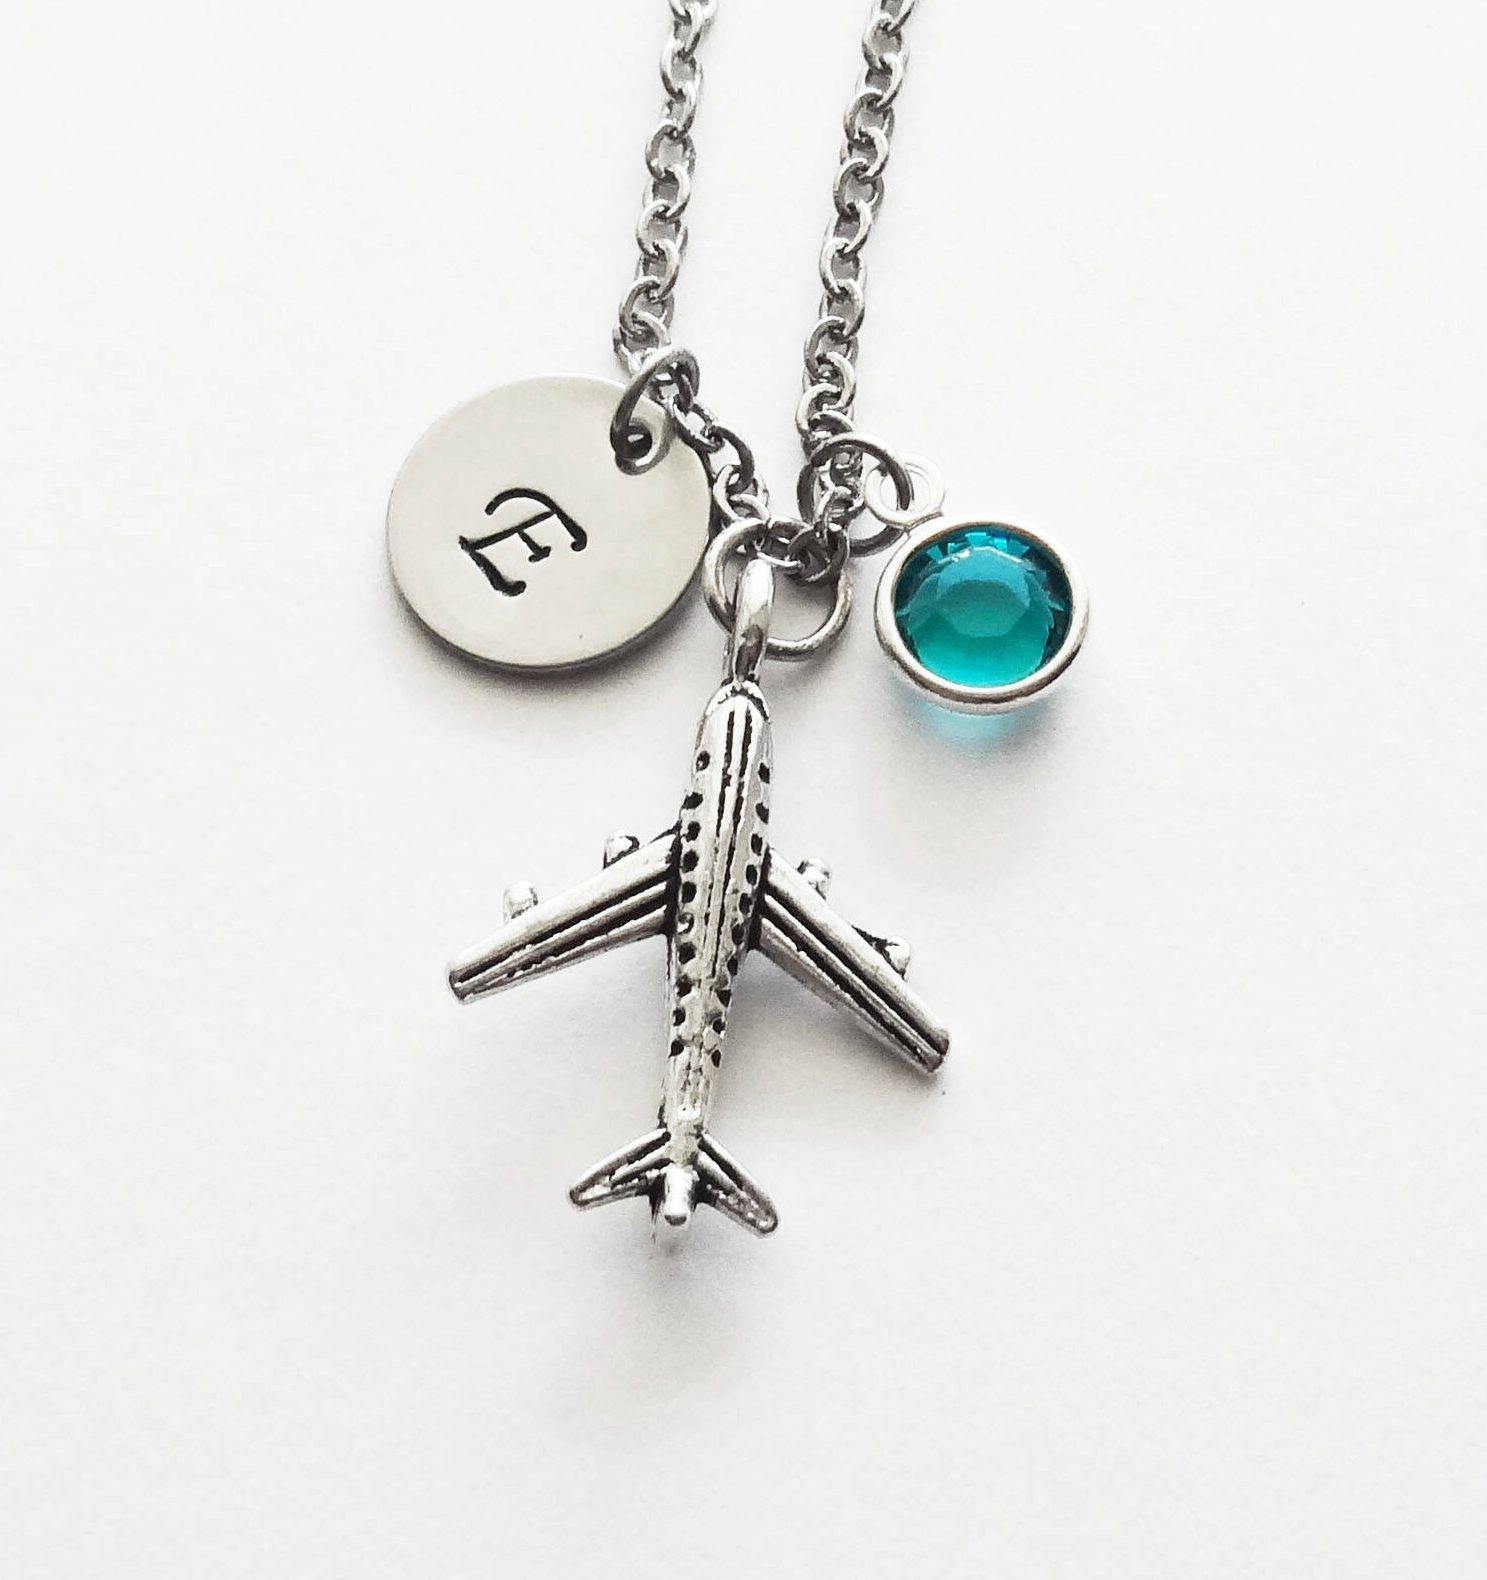 Airplane Keychain Flight Attendant Airplane Jewelry Initial Letter Birthstone Women Men Pilot Airplane Charm Airplane Pendant